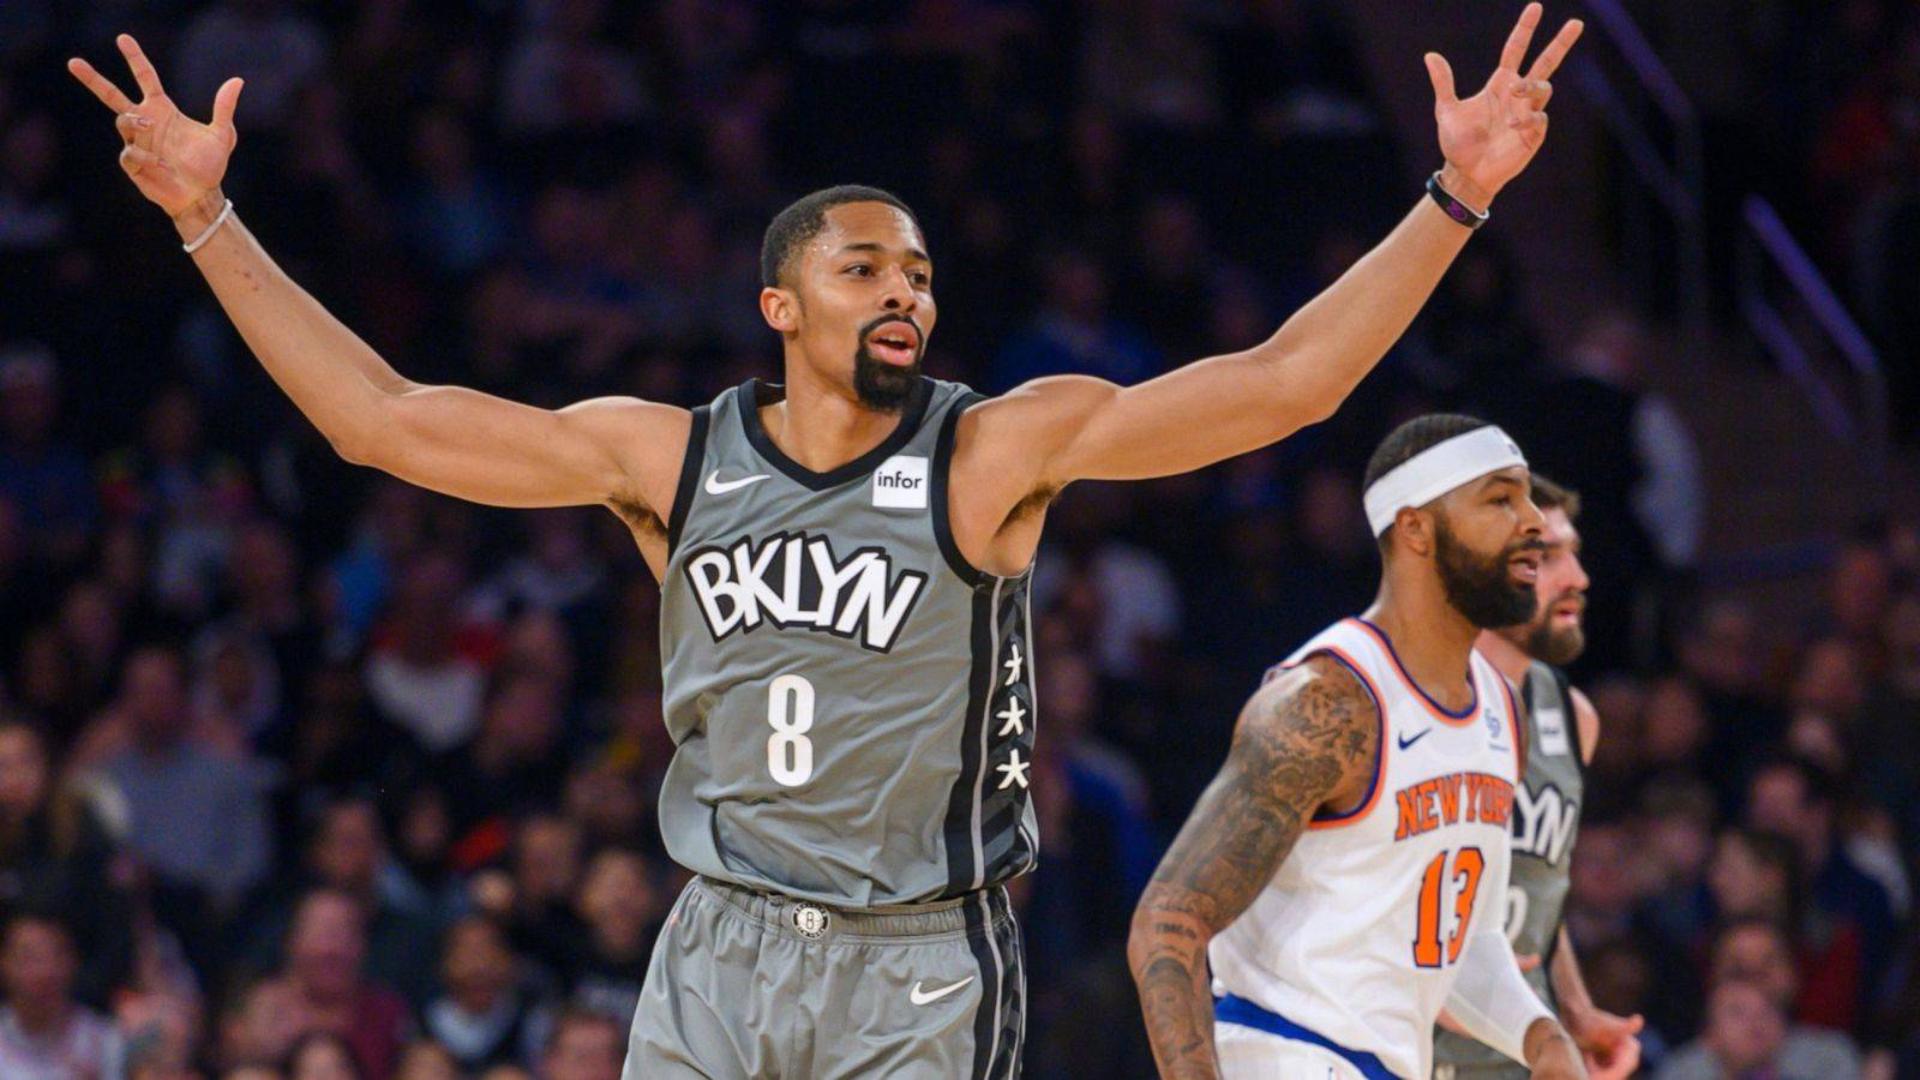 2019-2020 NBA常规赛 纽约尼克斯 VS 布鲁克林篮网 集锦Part1